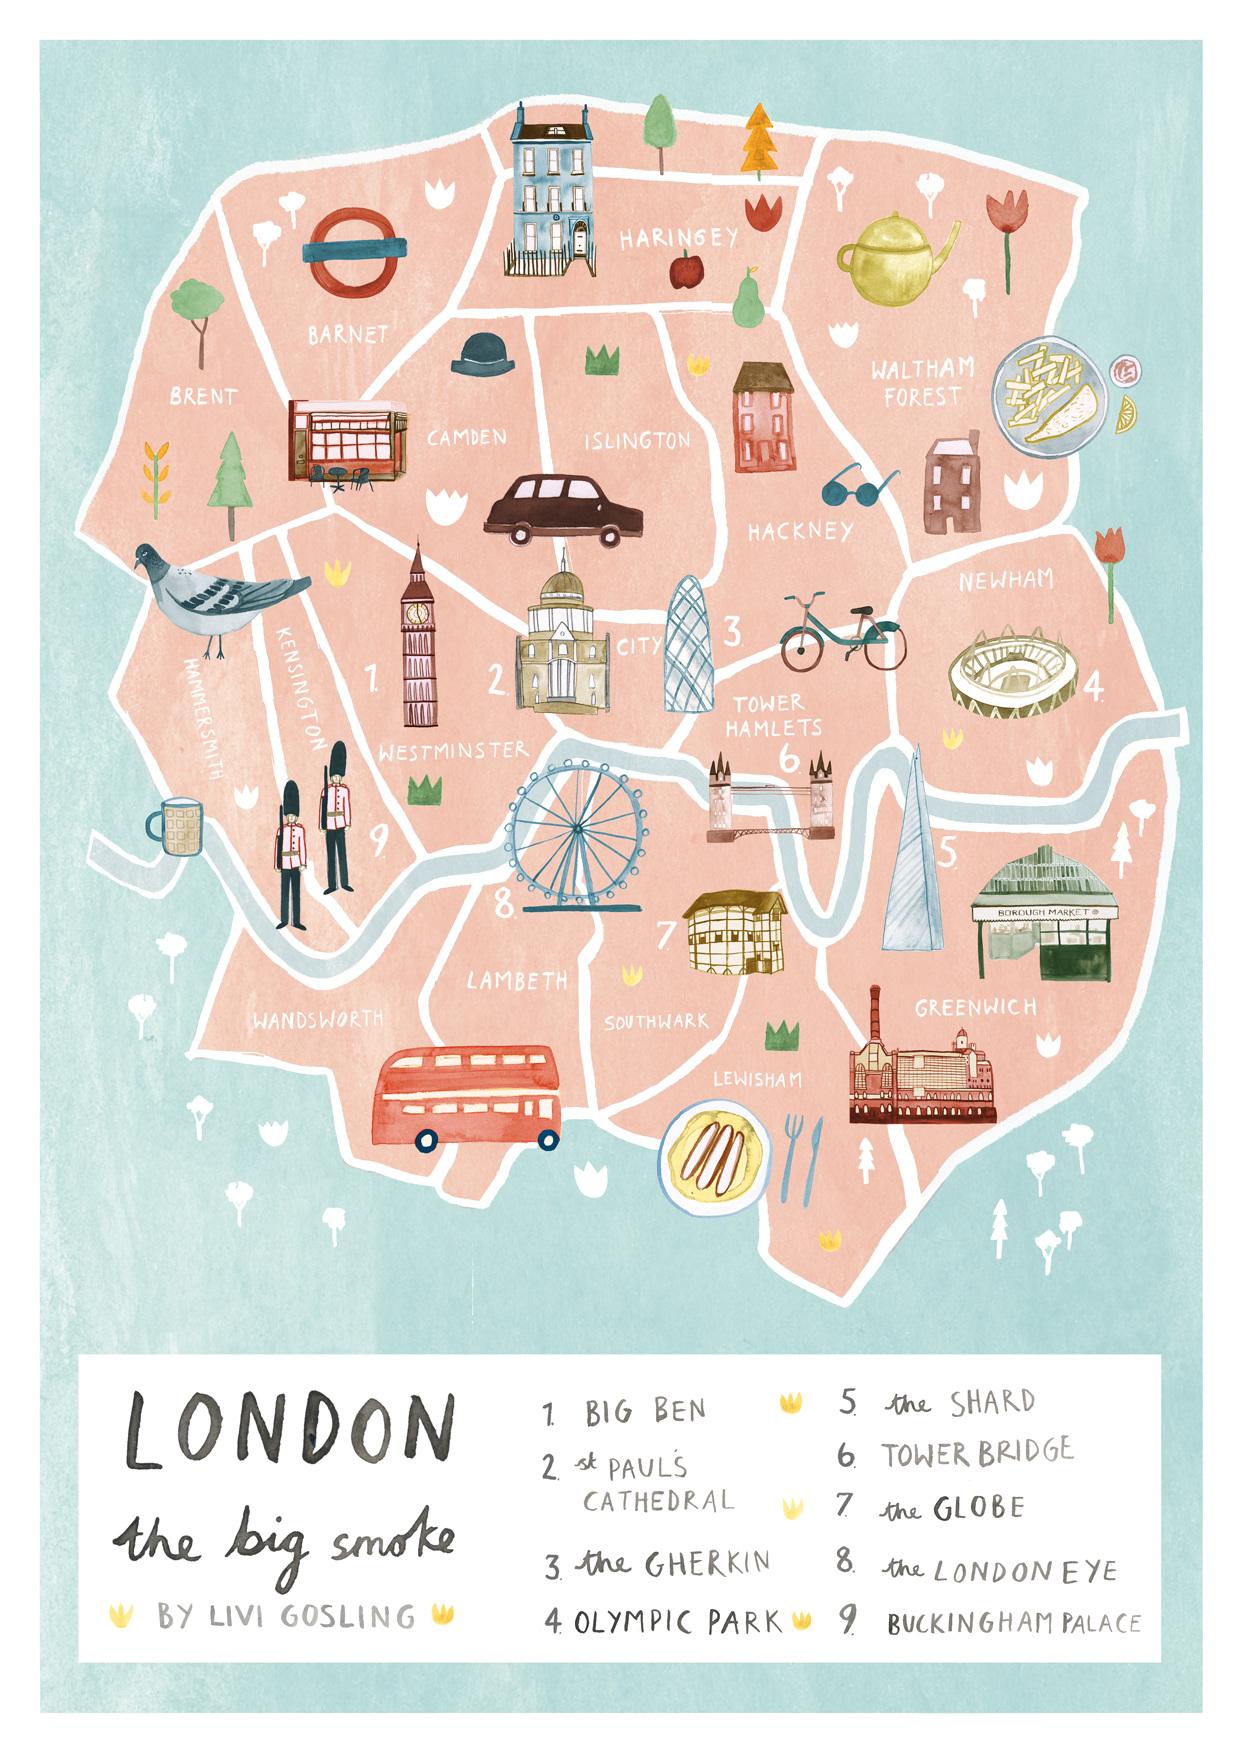 london-A6map-livi-gosling_1240.jpg